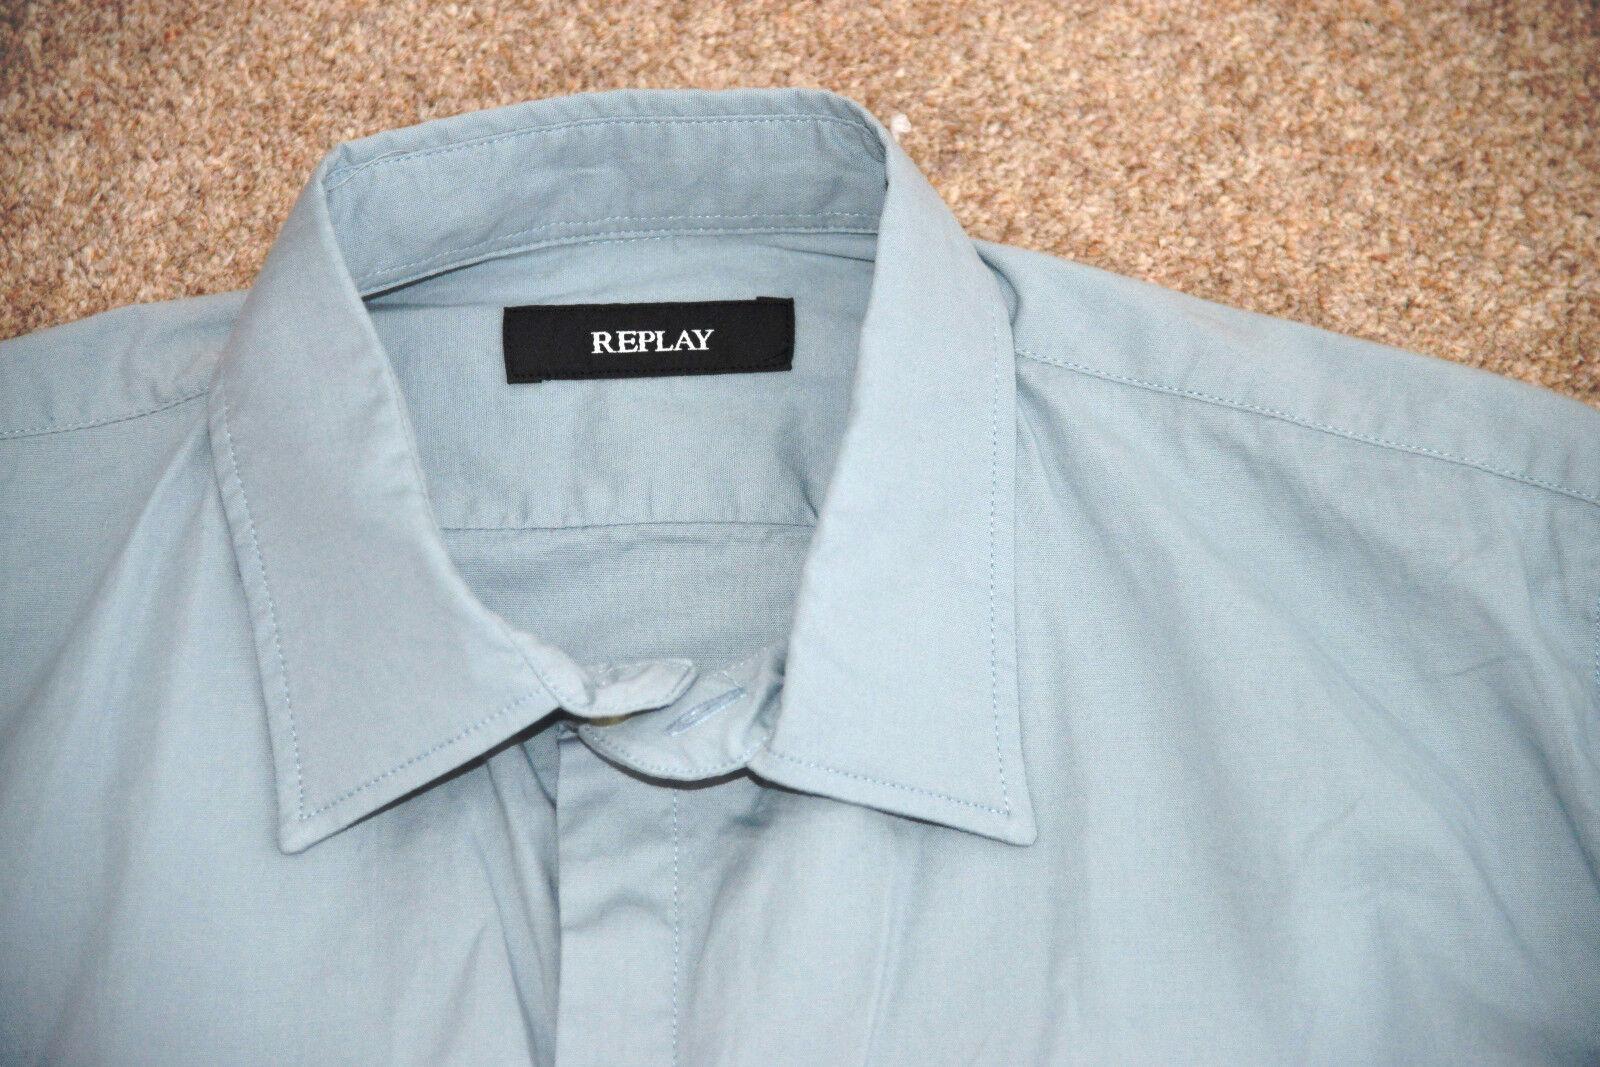 NUOVO REPLAY Classic Manica Lunga Camicia Camicia Camicia Casual Slim Fit Turchese M4921 M80279A M 0c0b16